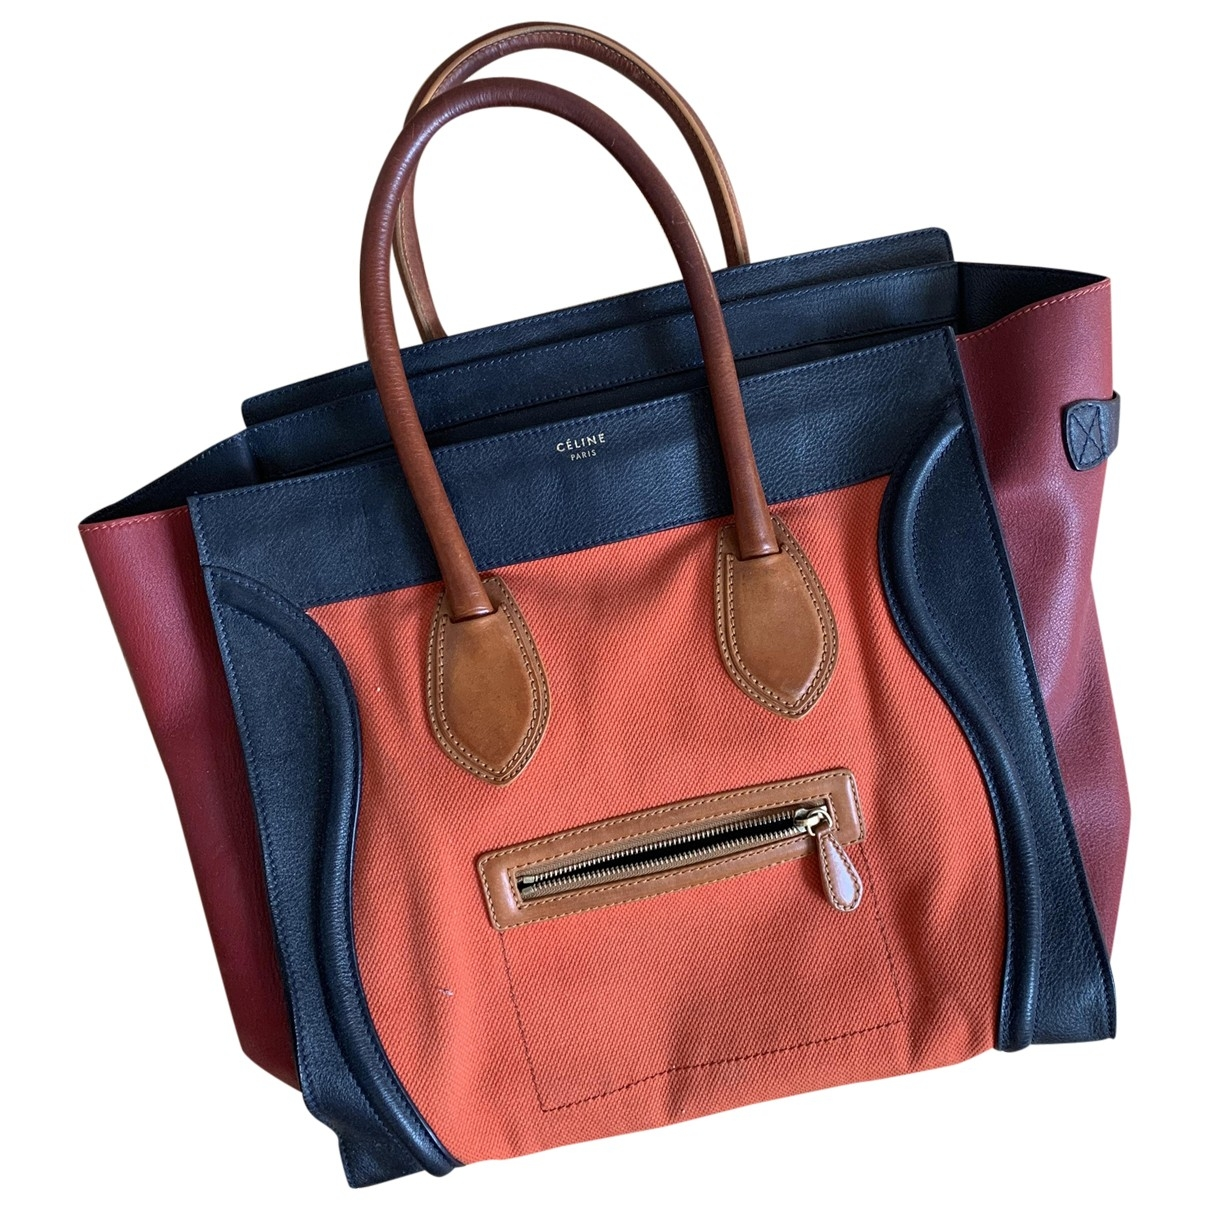 Bolso  Luggage de Lona Celine